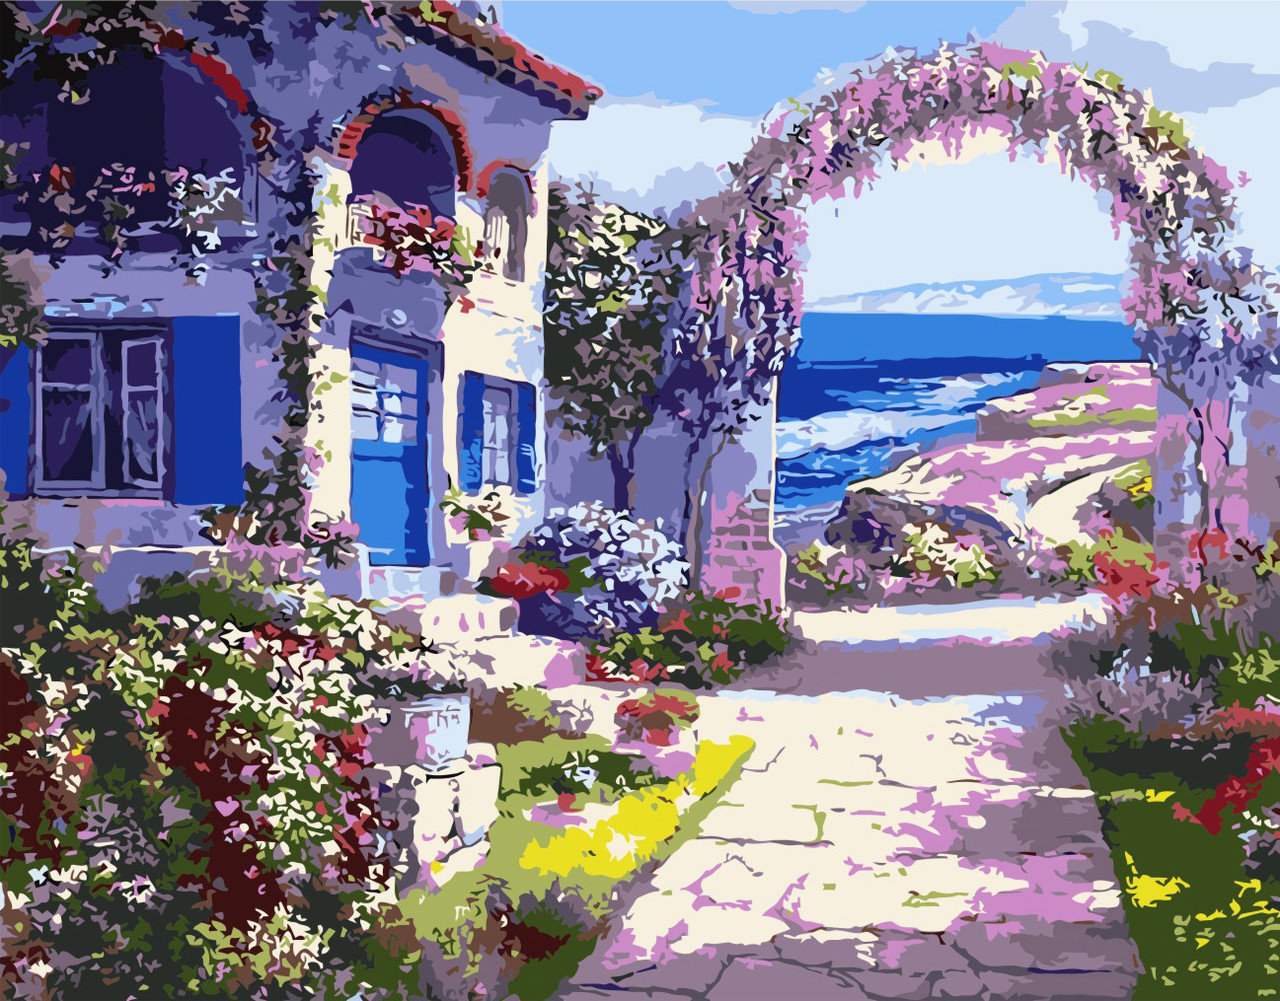 Картина по номерам VA-0481 Дом с цветами, 40х50см. Strateg